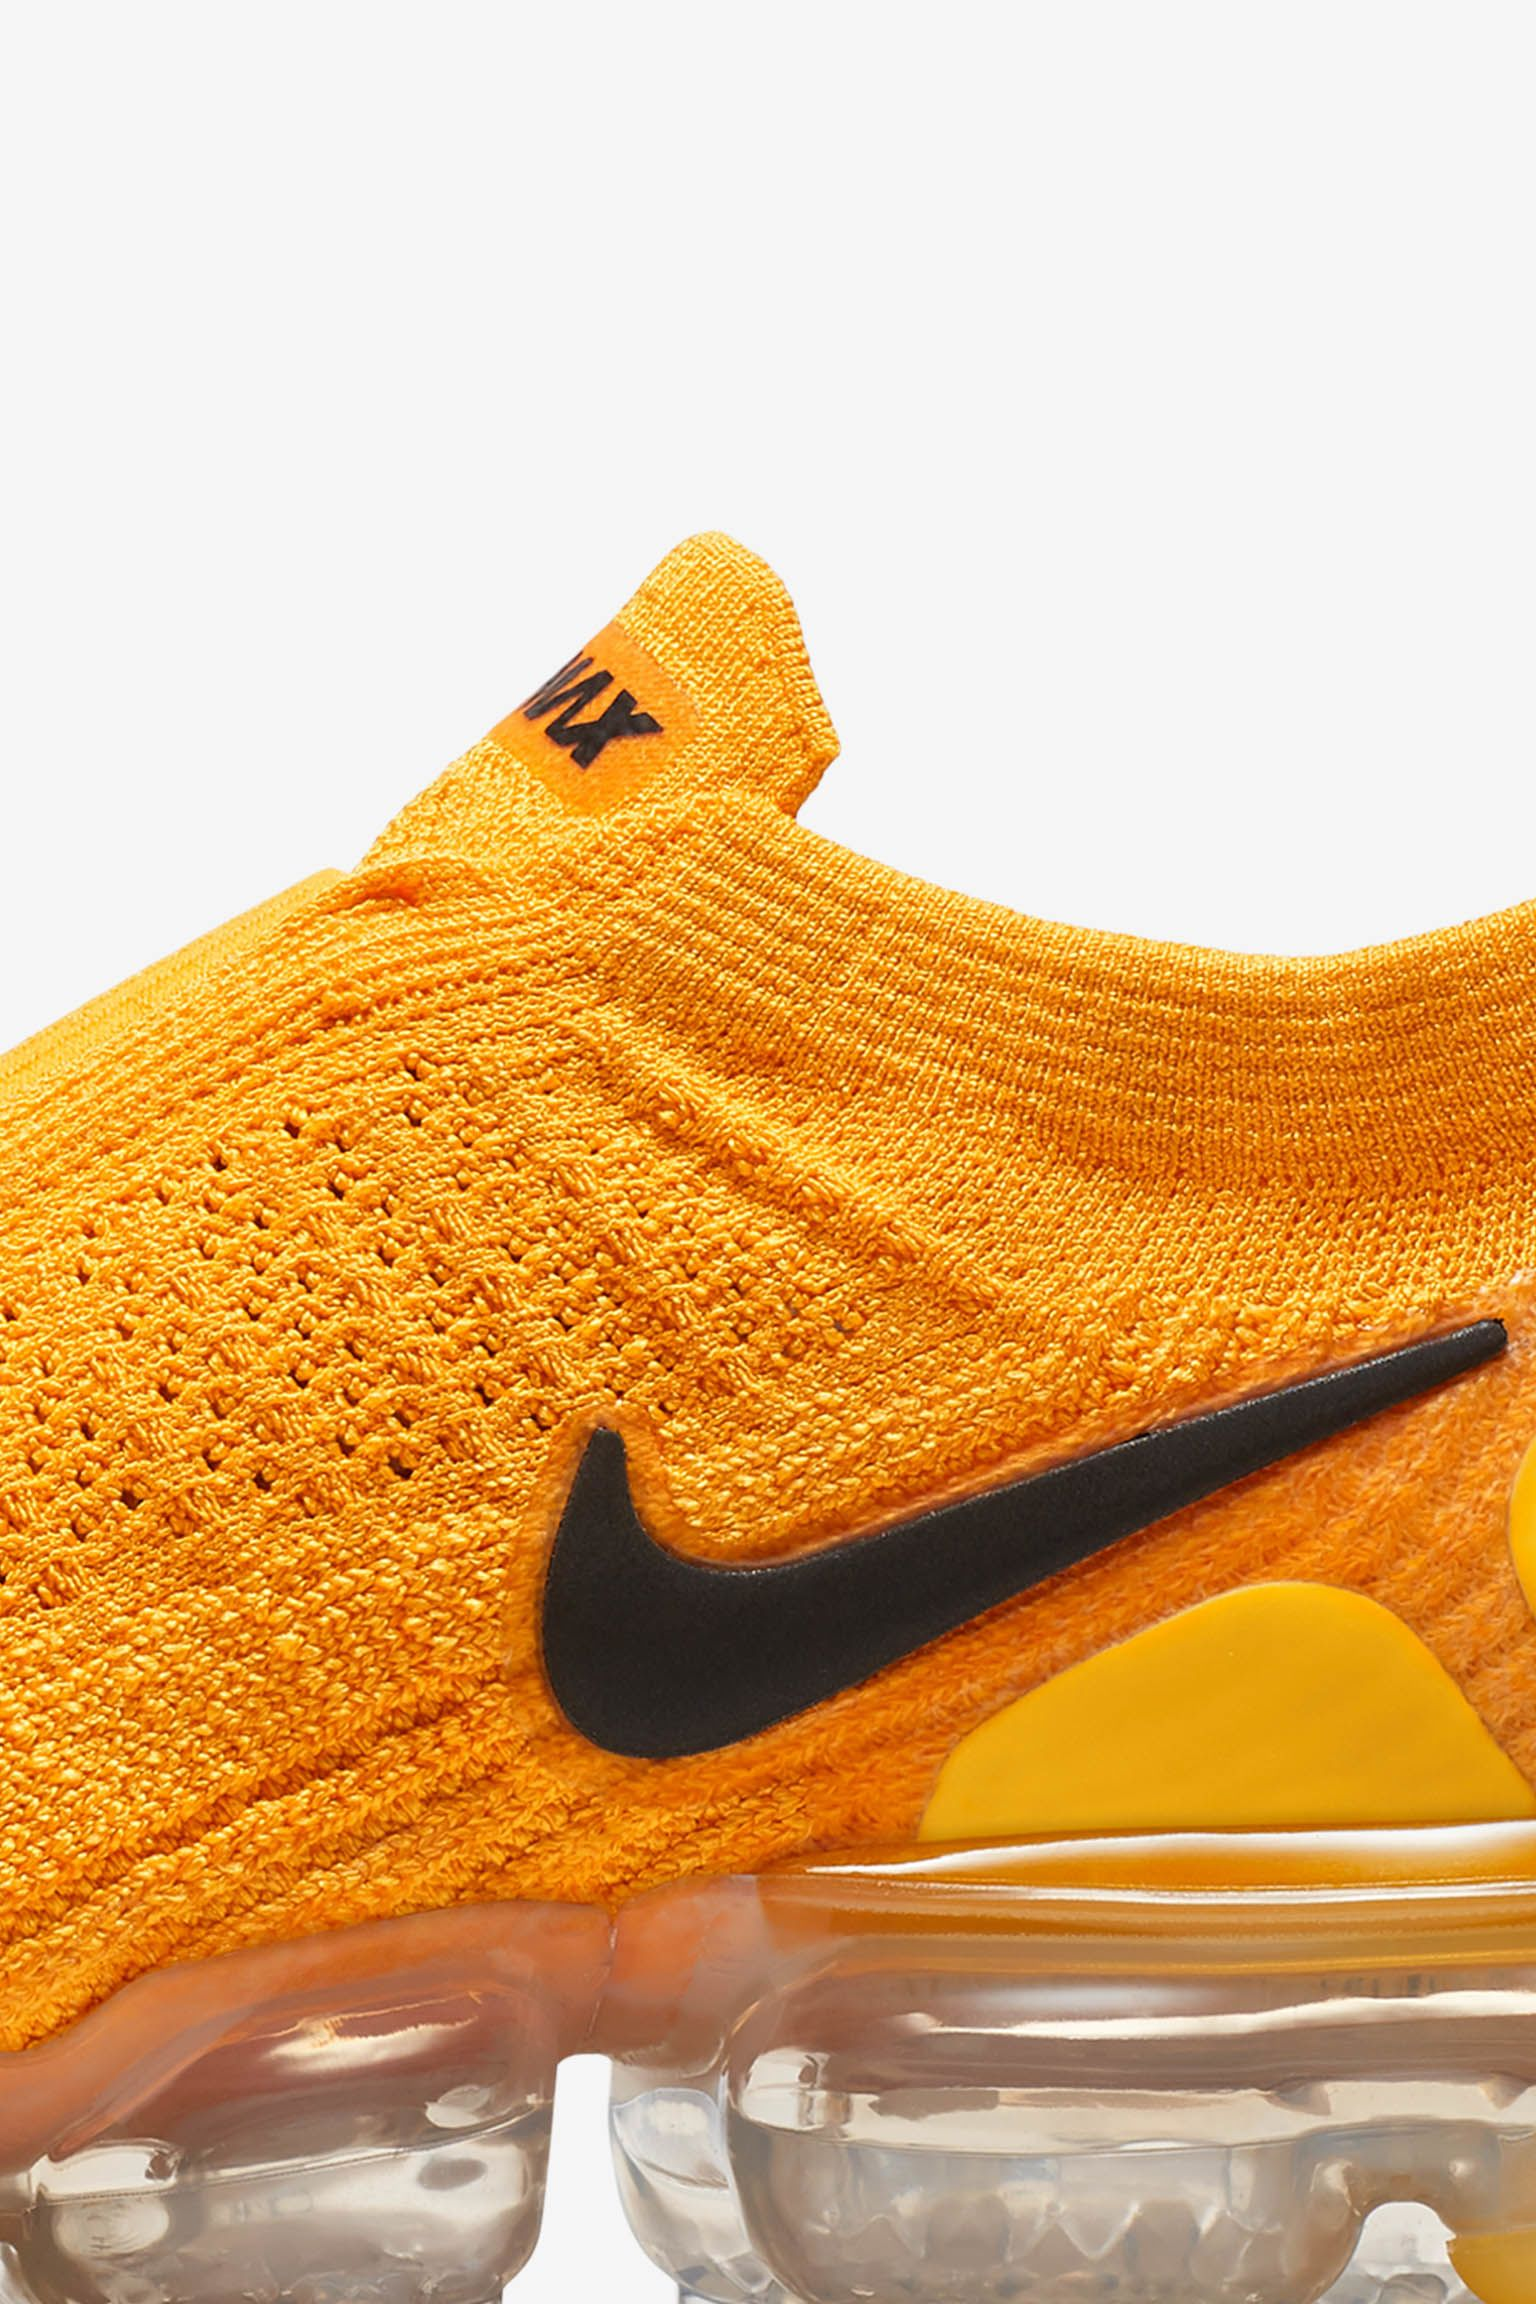 3daaa6e323 Release Gold Vapormax Moc Women's amp; Air 'university Nike Black' 2 zwxYT